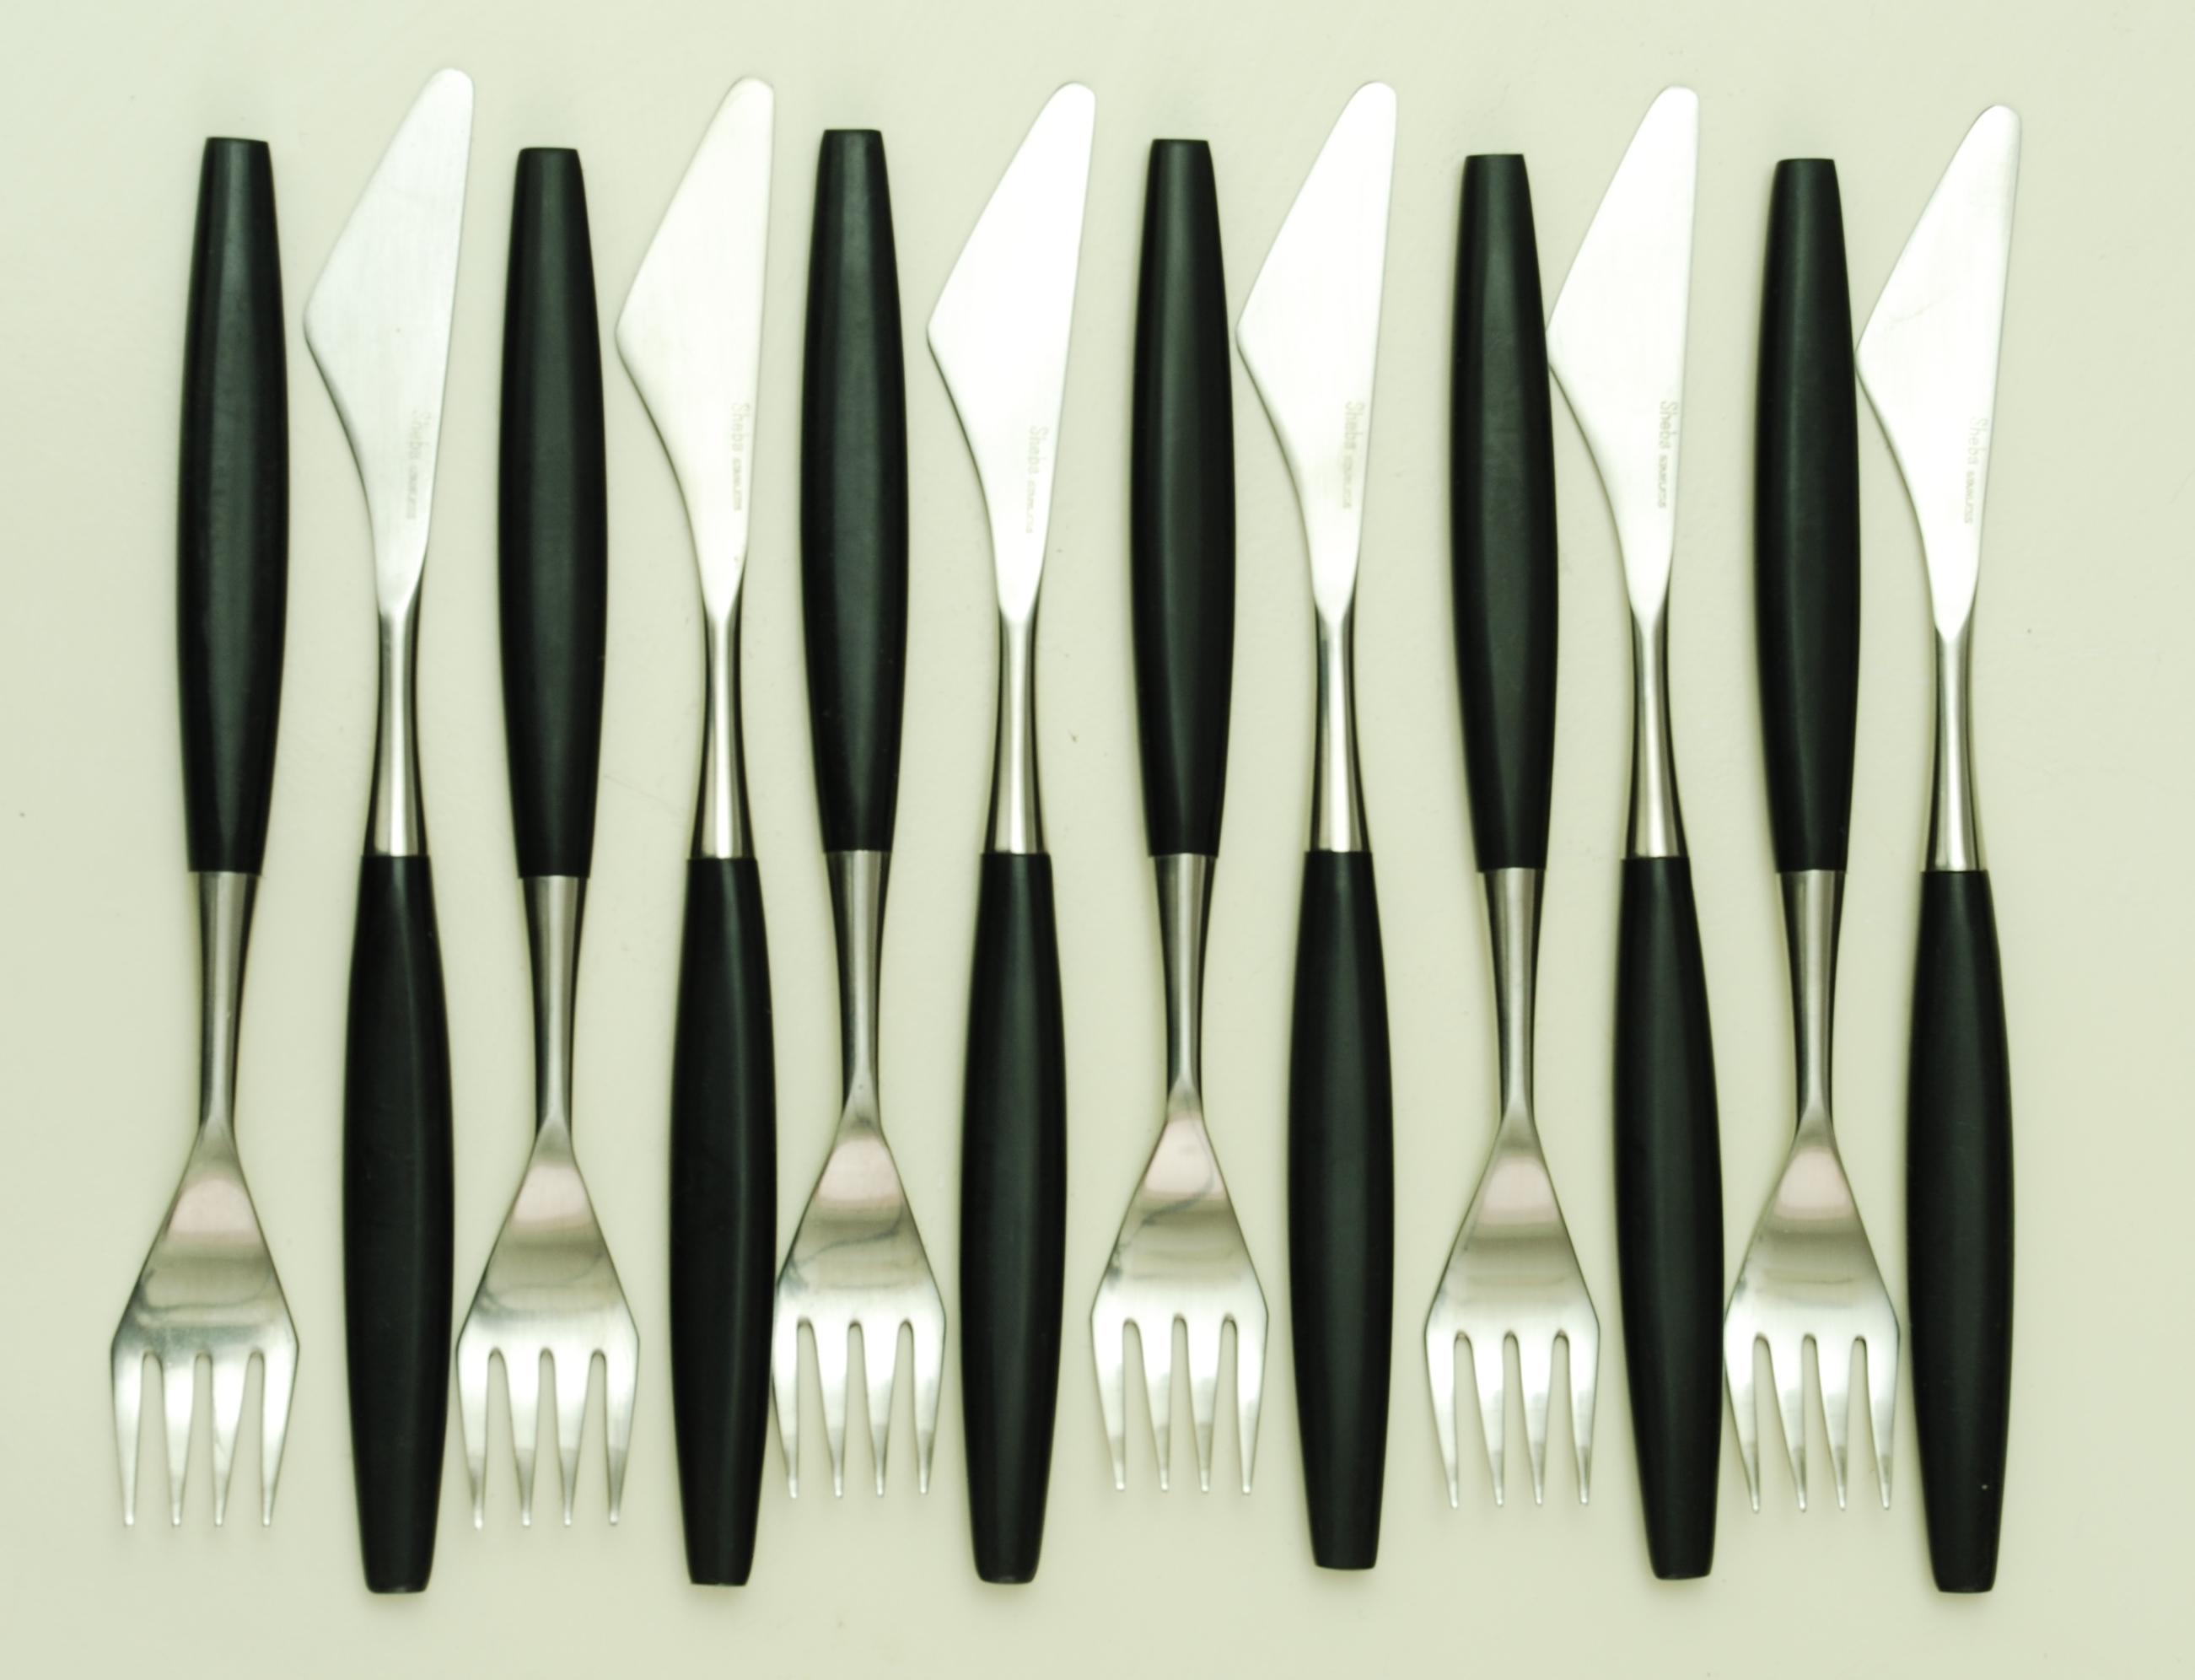 Butlers Sheba stainless steel cutlery (2